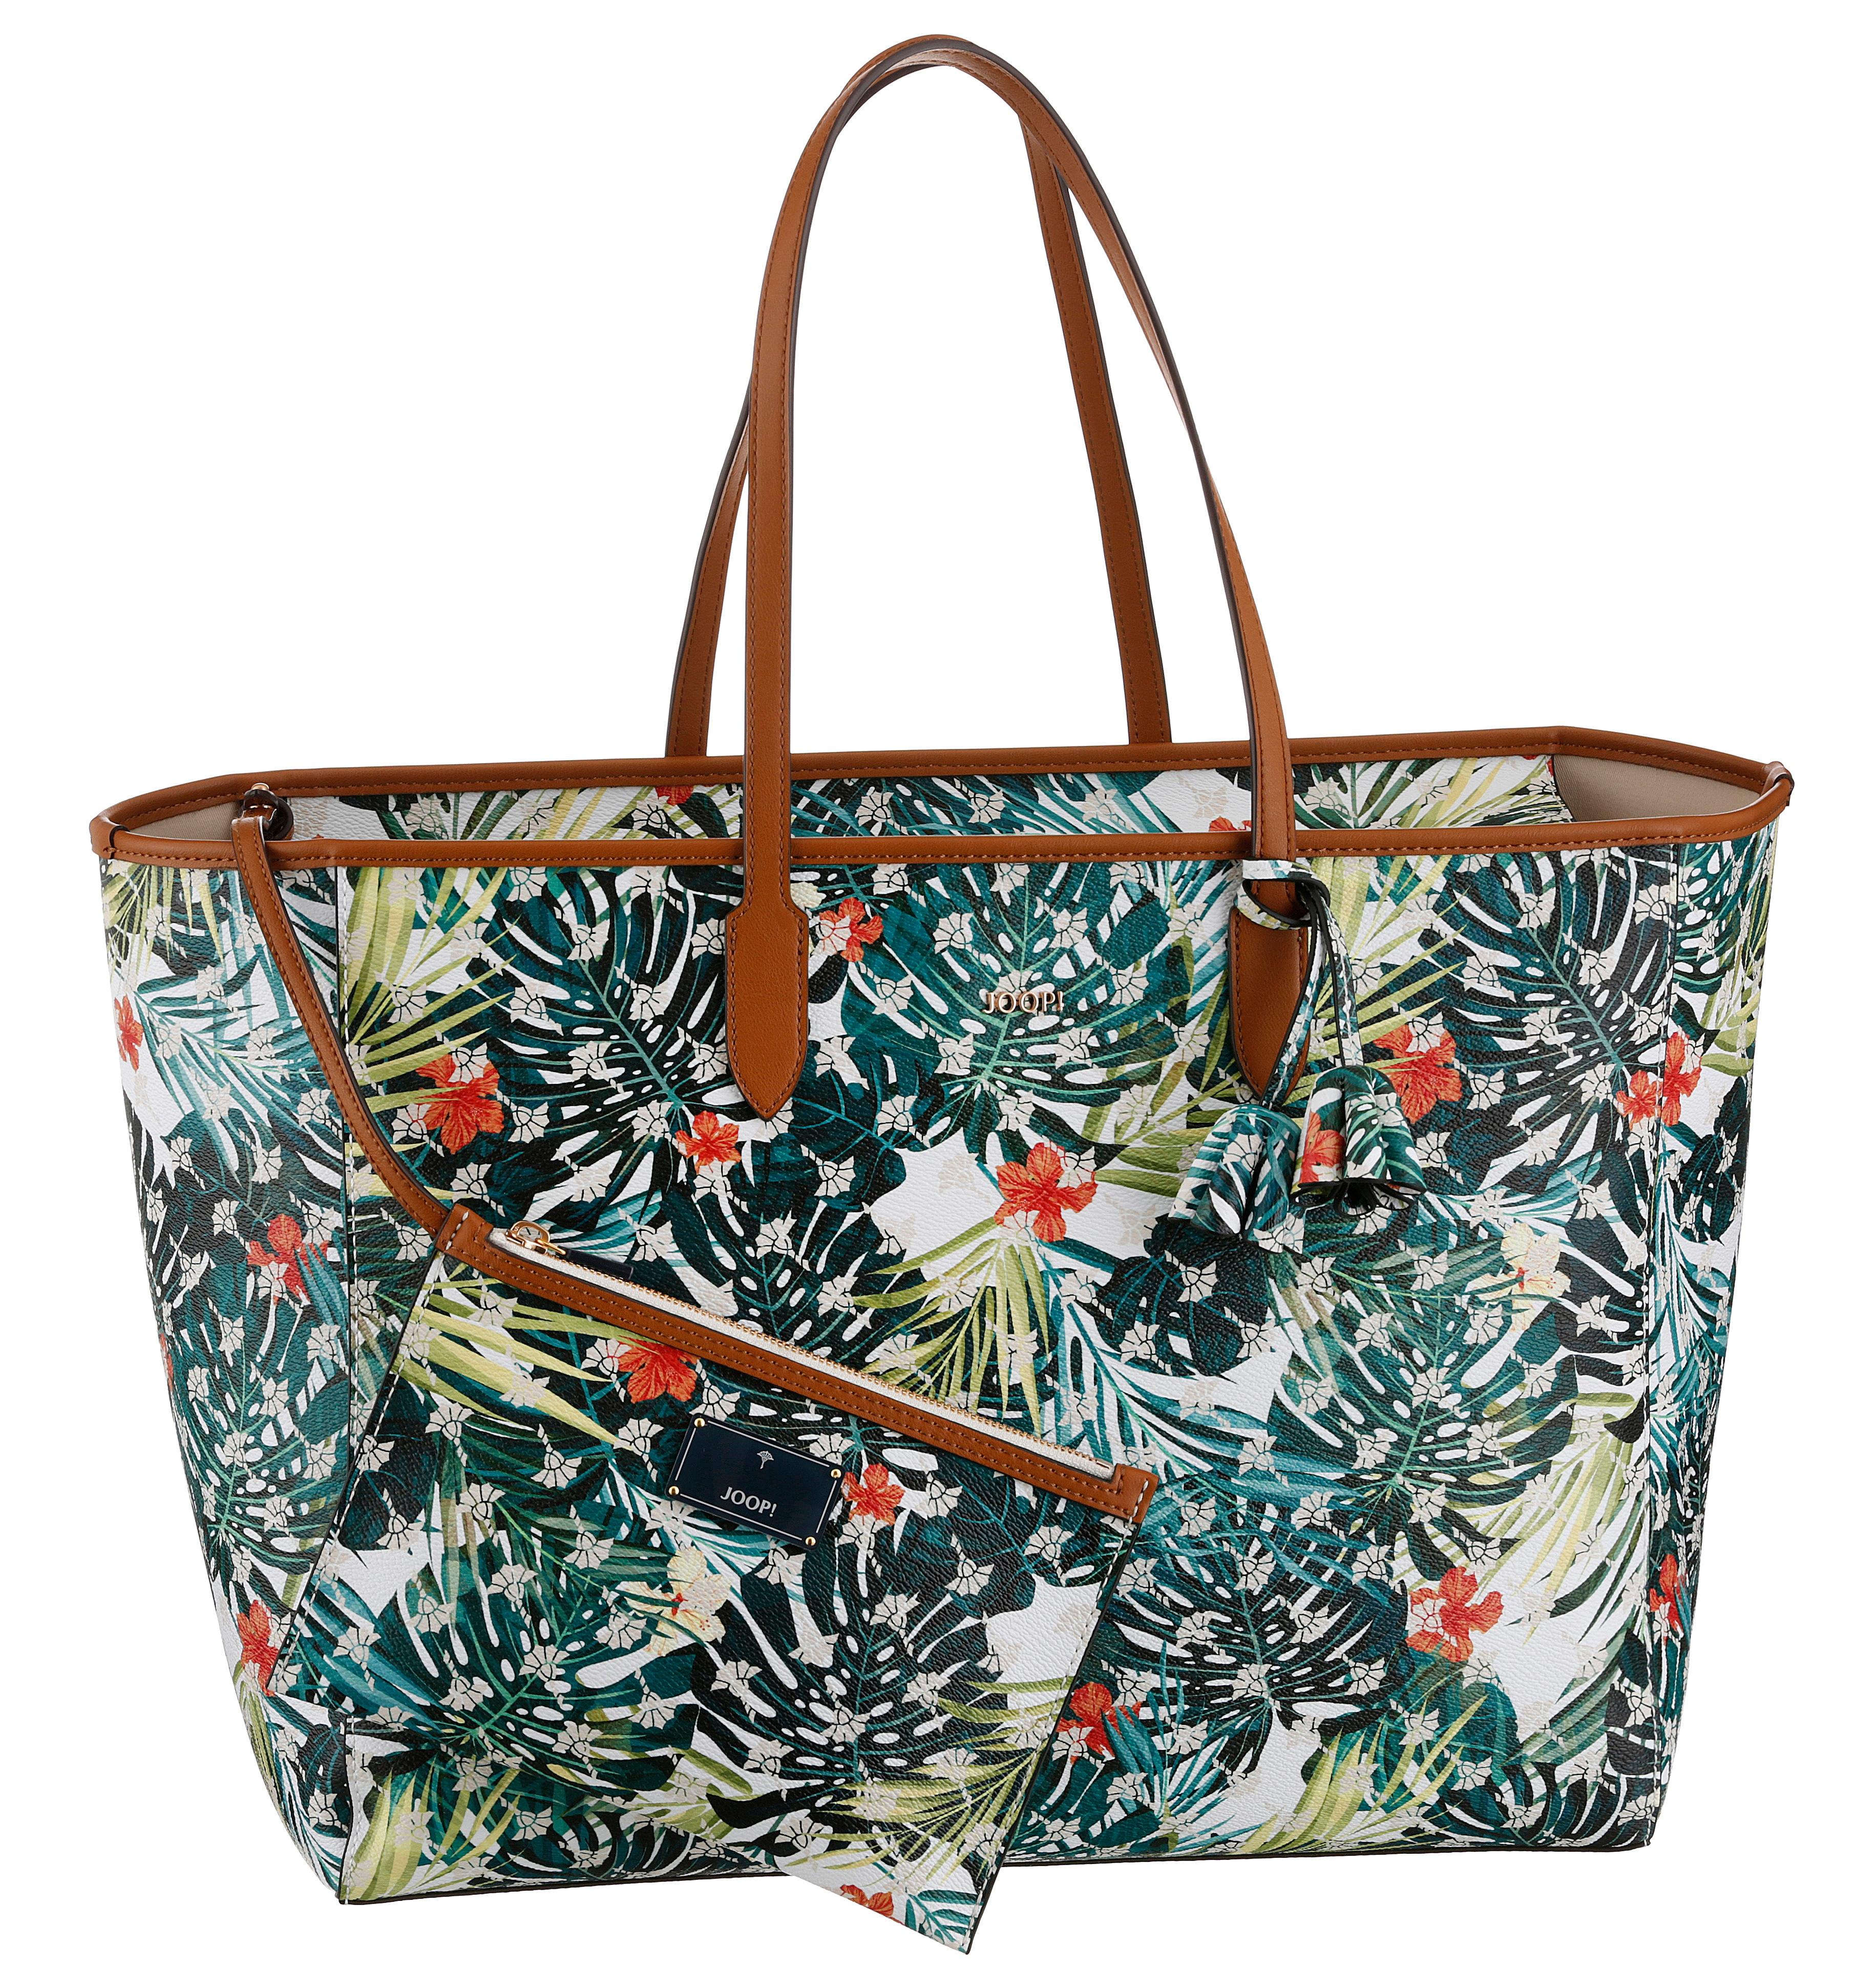 joop! - Joop Shopper, mit kleiner, abnehmbarer Reißverschluss-Tasche